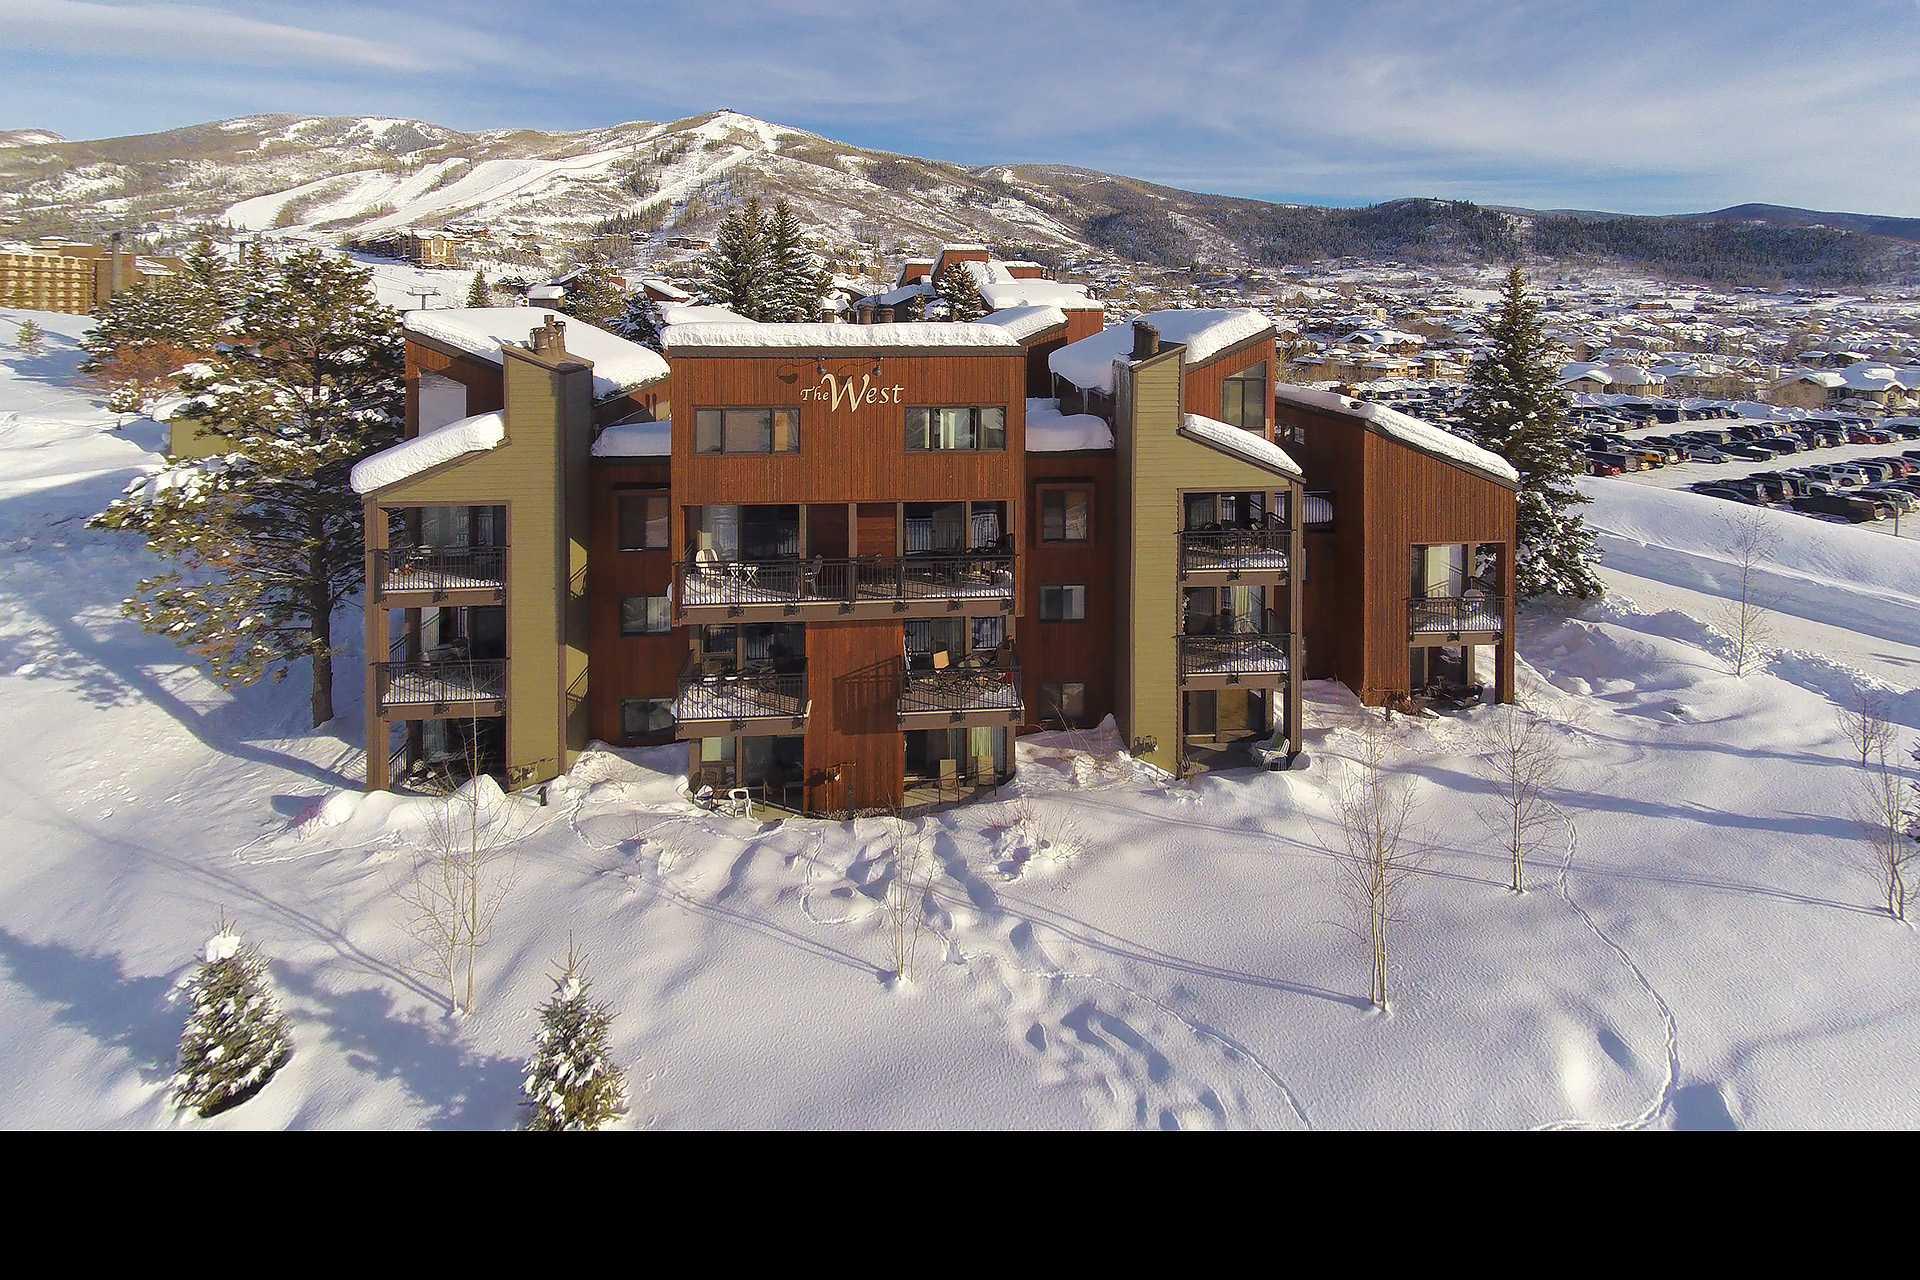 W3301: The West Condominiums